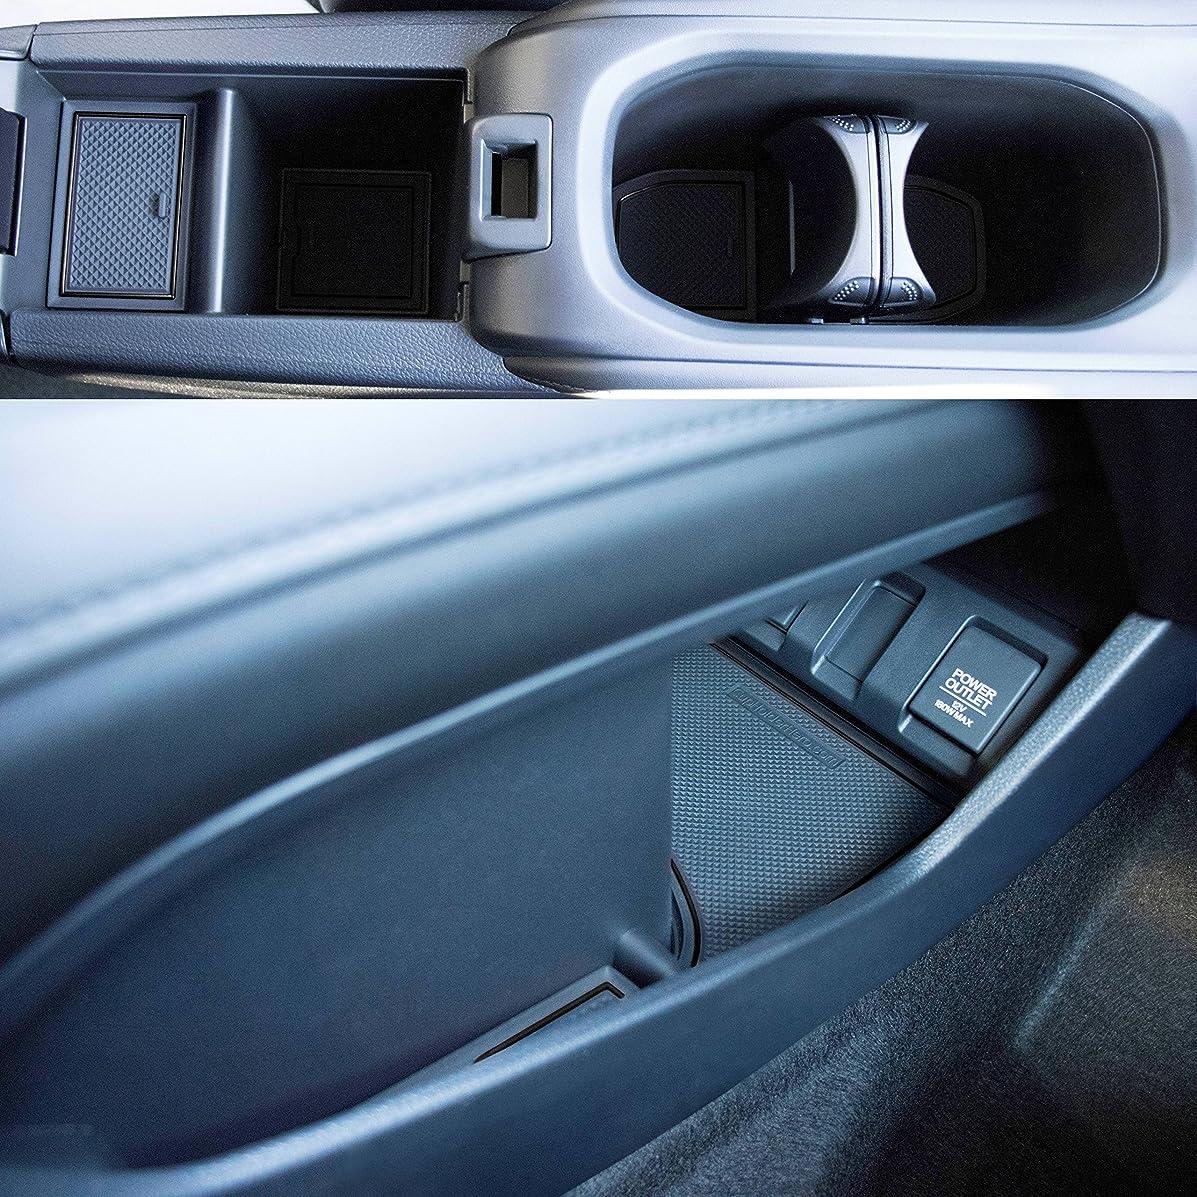 Custom Fit Cup Holder and Door Liner Accessories for 2018 2017 2016 Honda HR-V 18-pc Set (Solid Black)